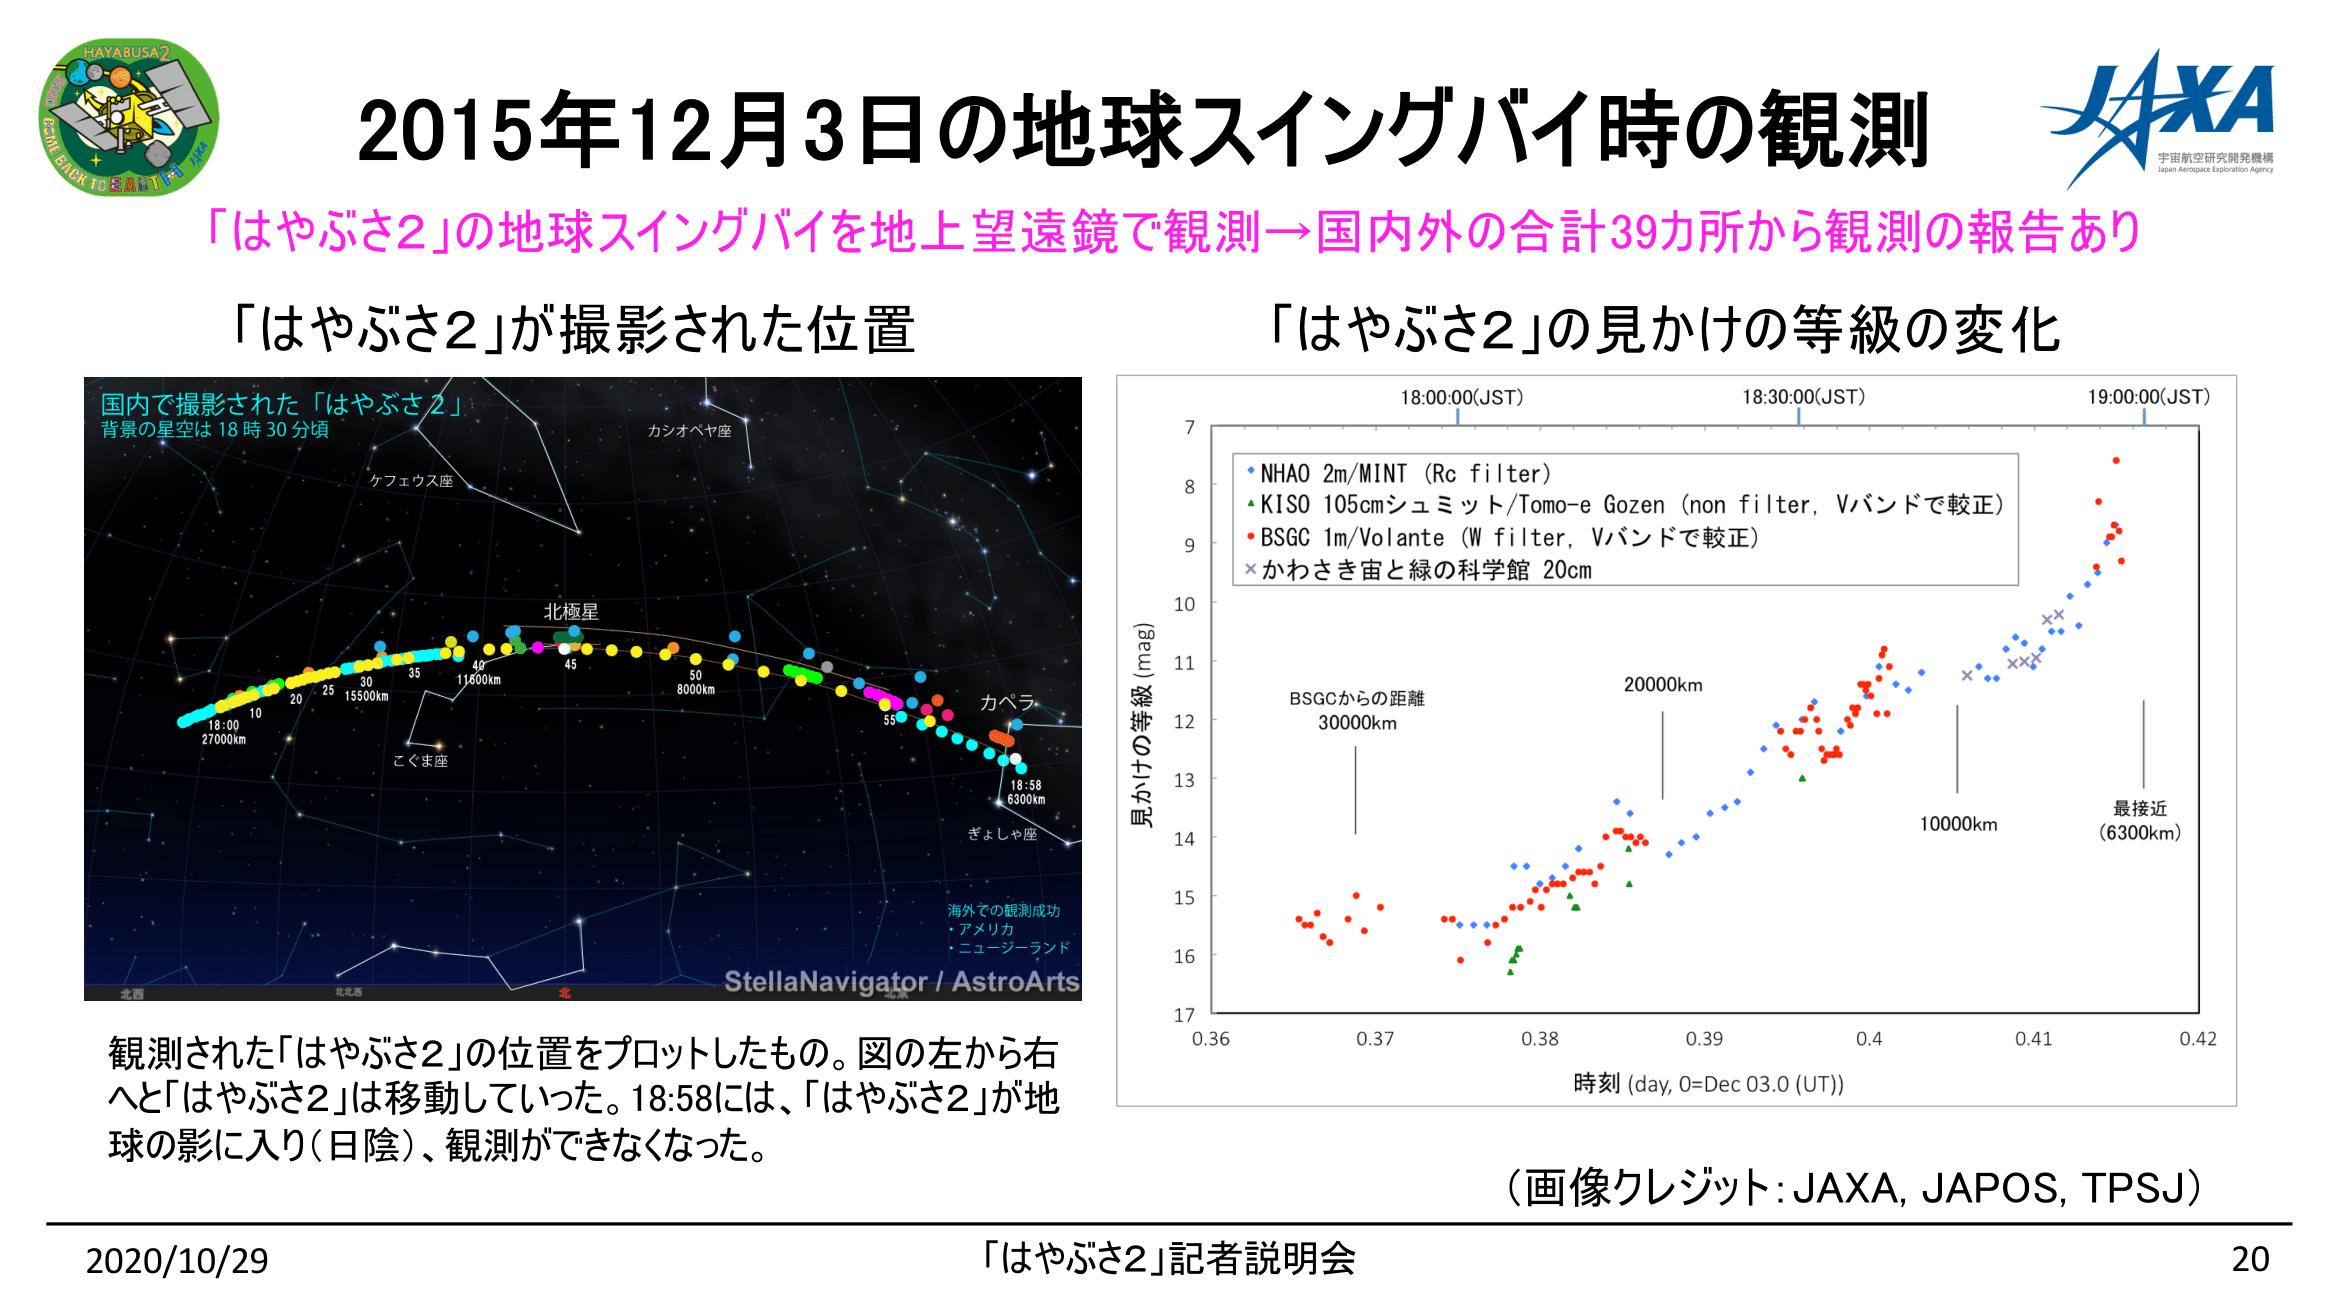 f:id:Imamura:20201029161451p:plain